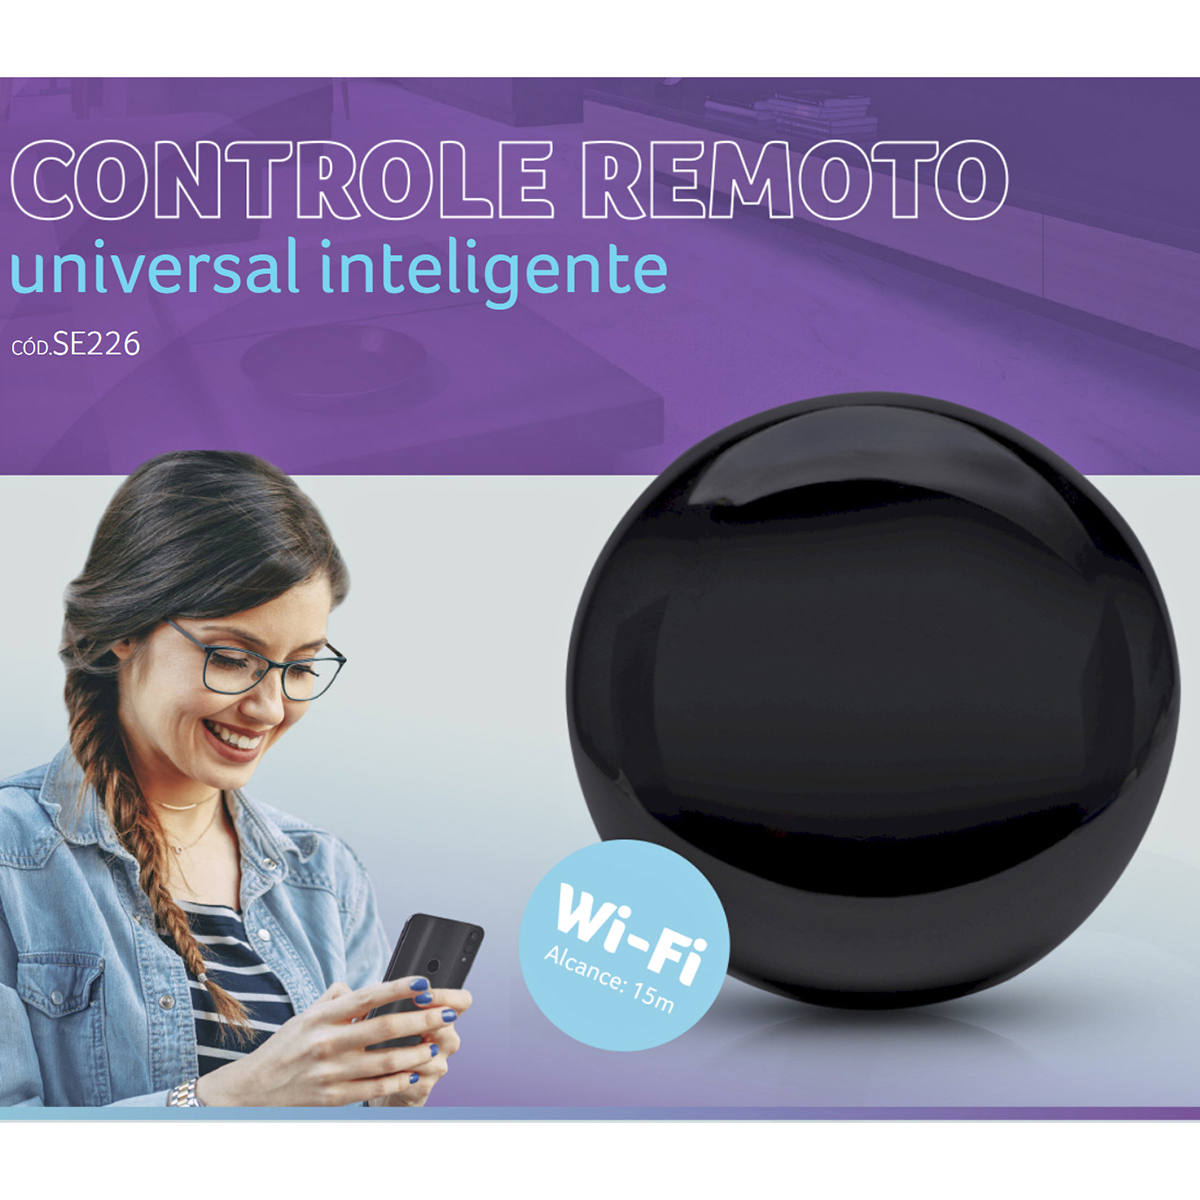 Controle Remoto Universal Inteligente Wi-Fi Alcance 10m Transmissão em 180 graus Multilaser Liv SE226